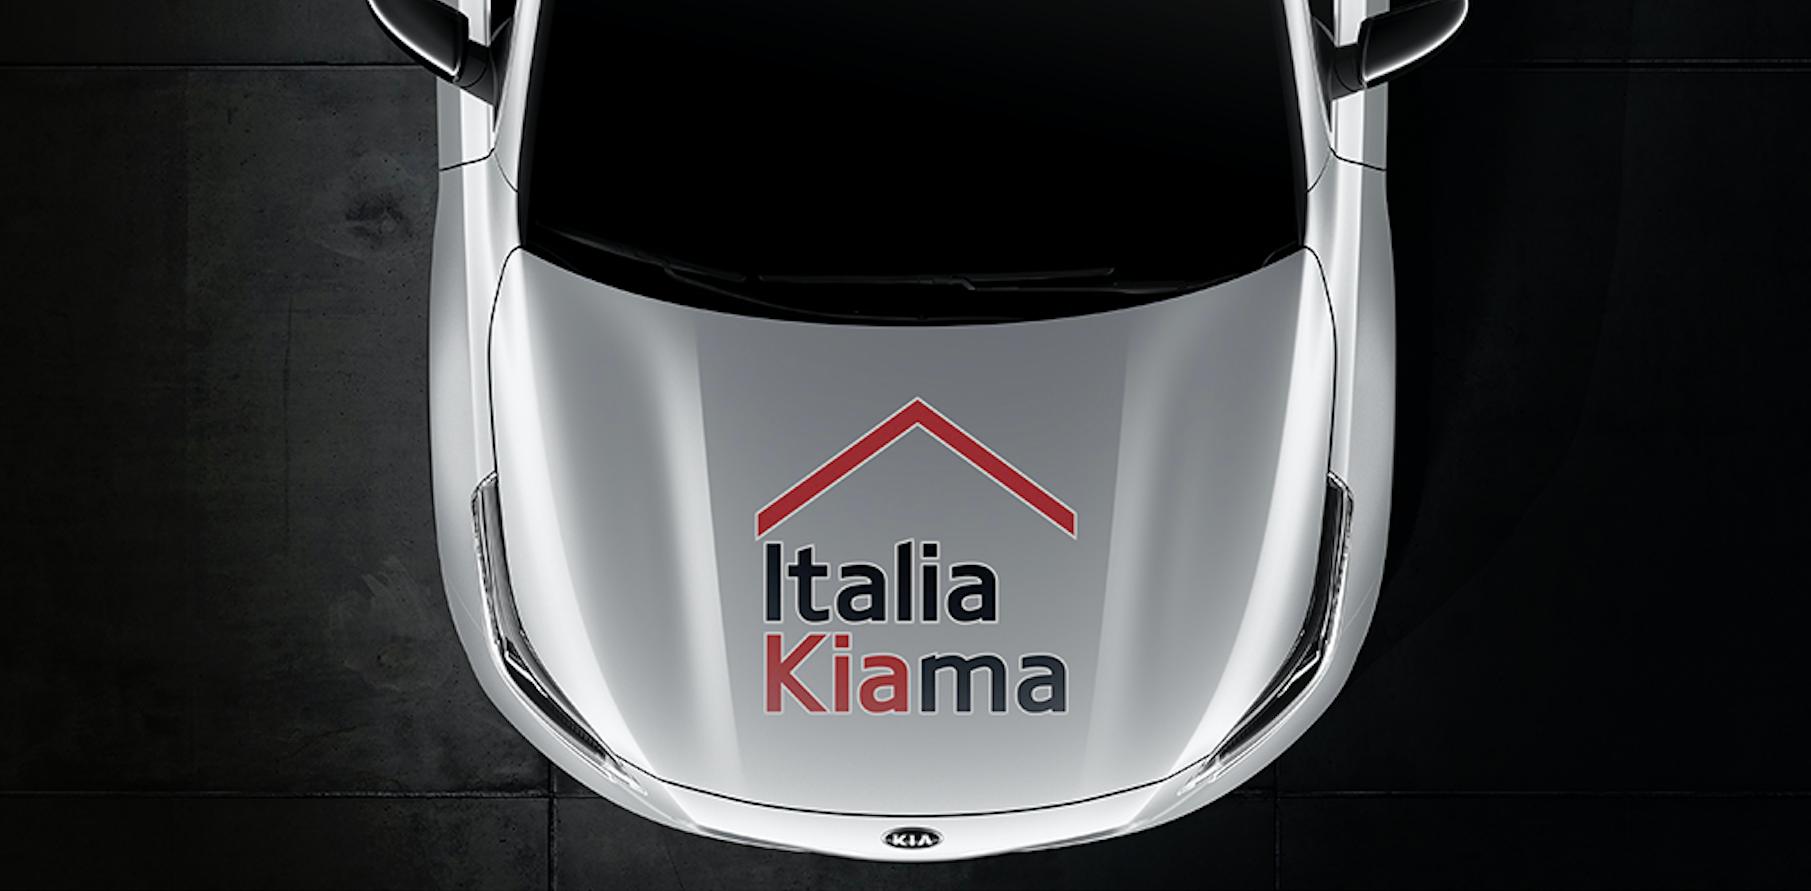 #ITALIAKIAMA